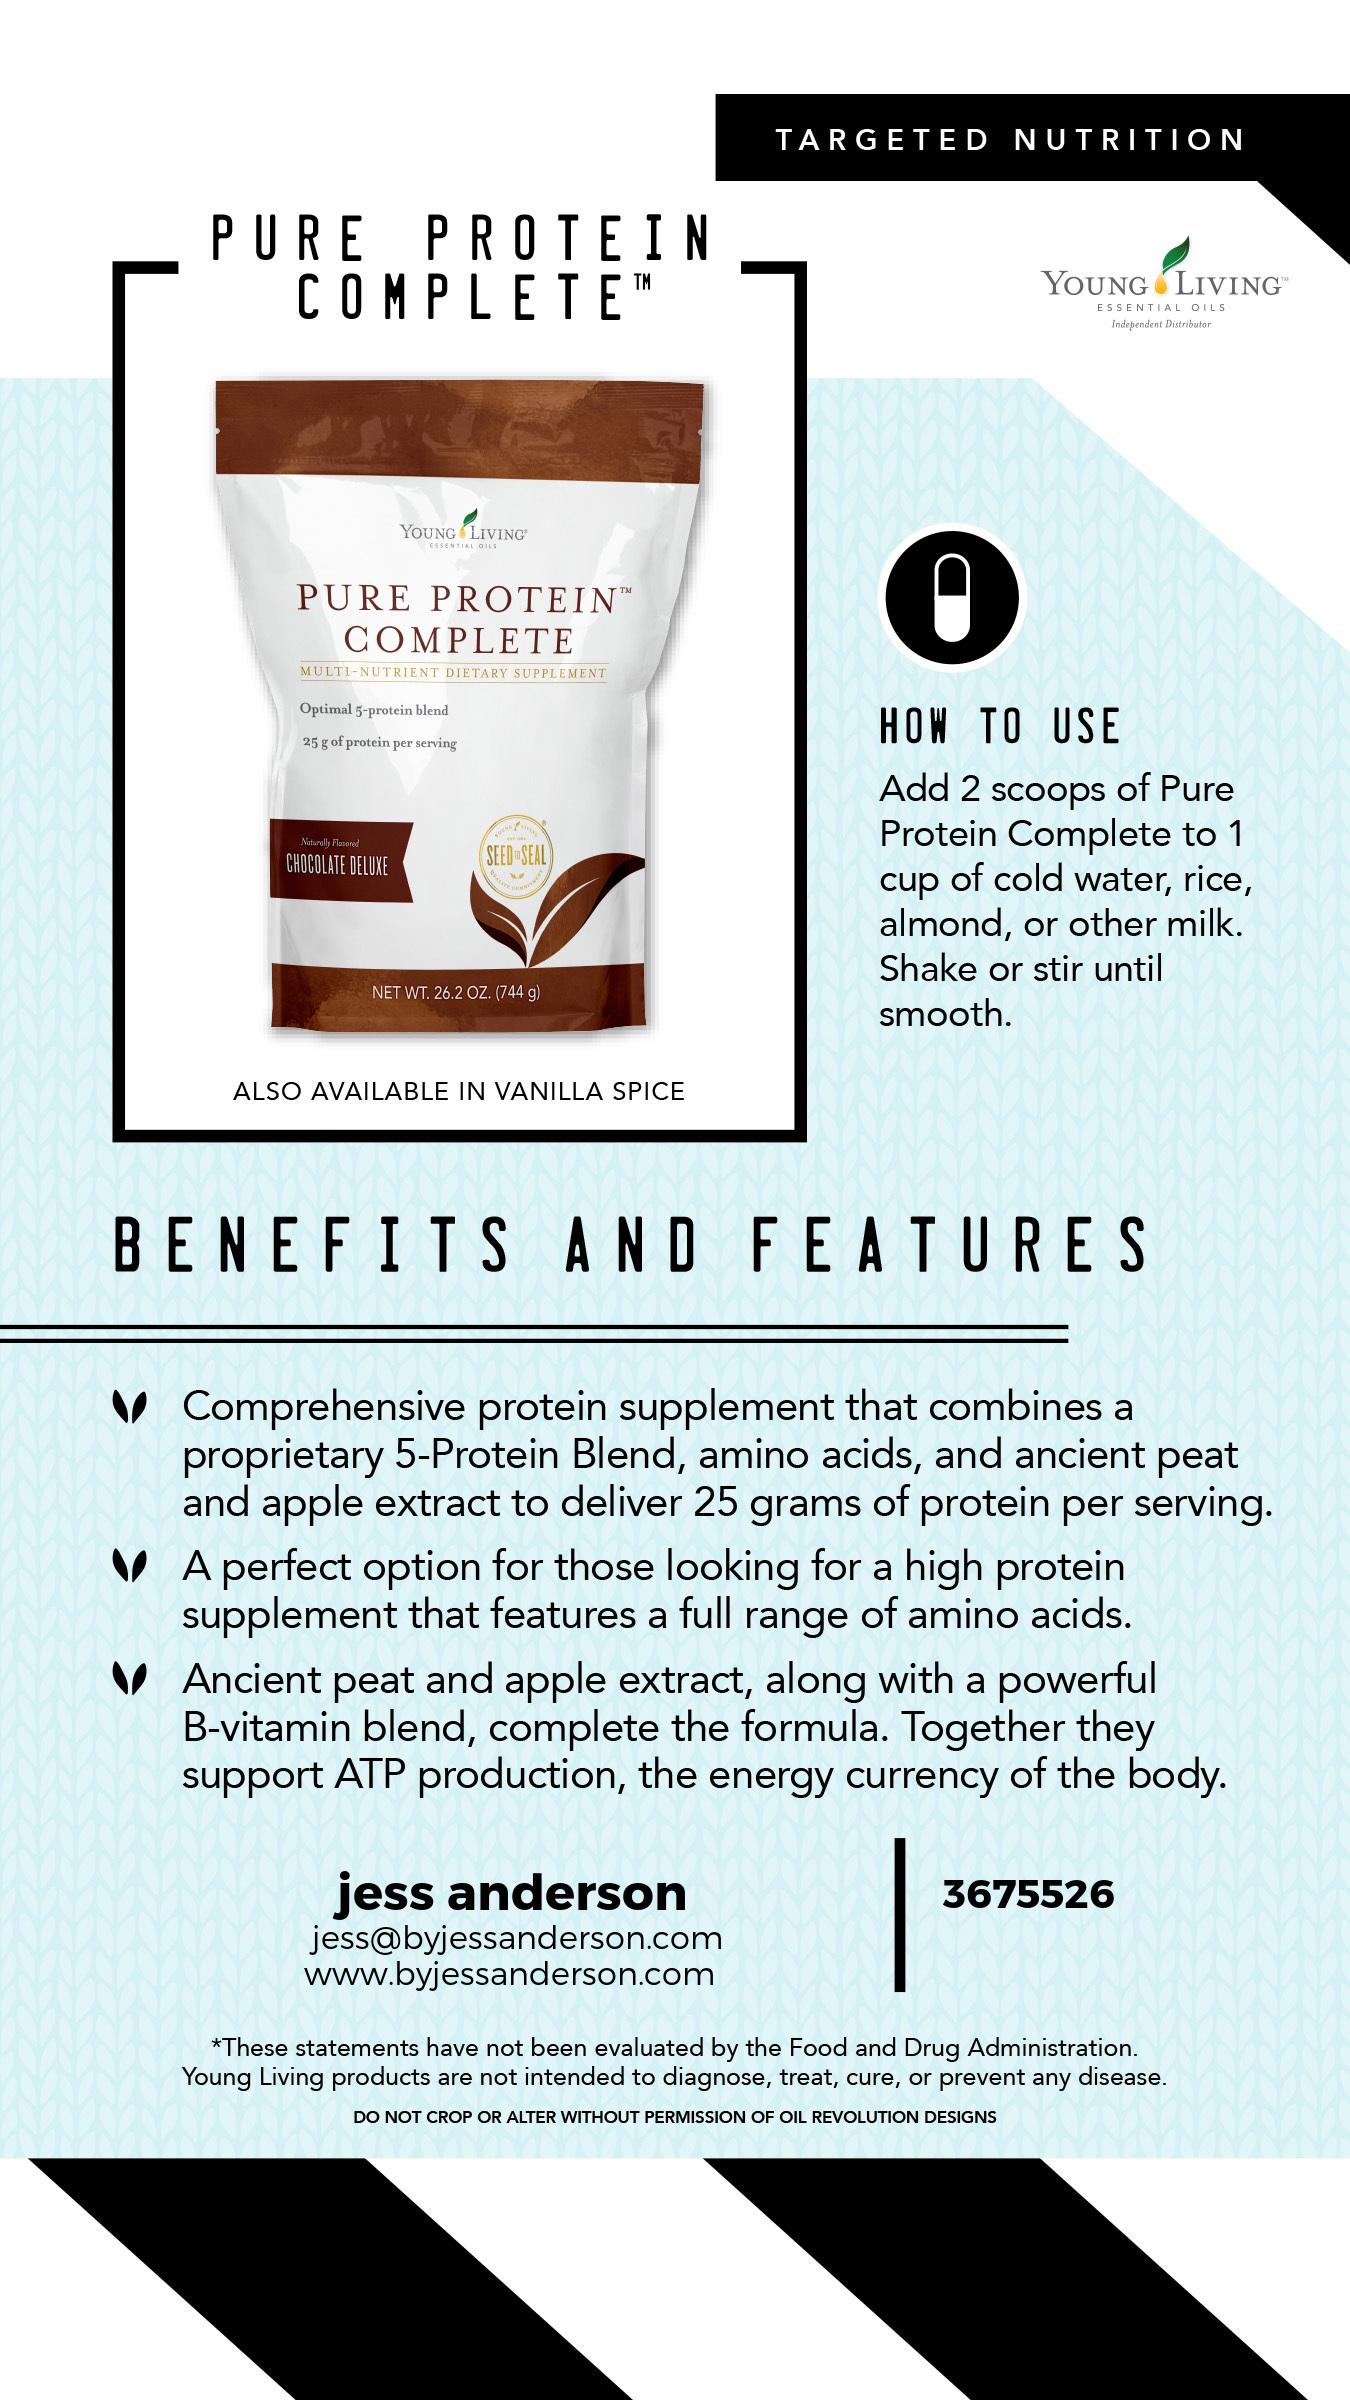 19-Pure-Protein-Complete-Instastory.jpg